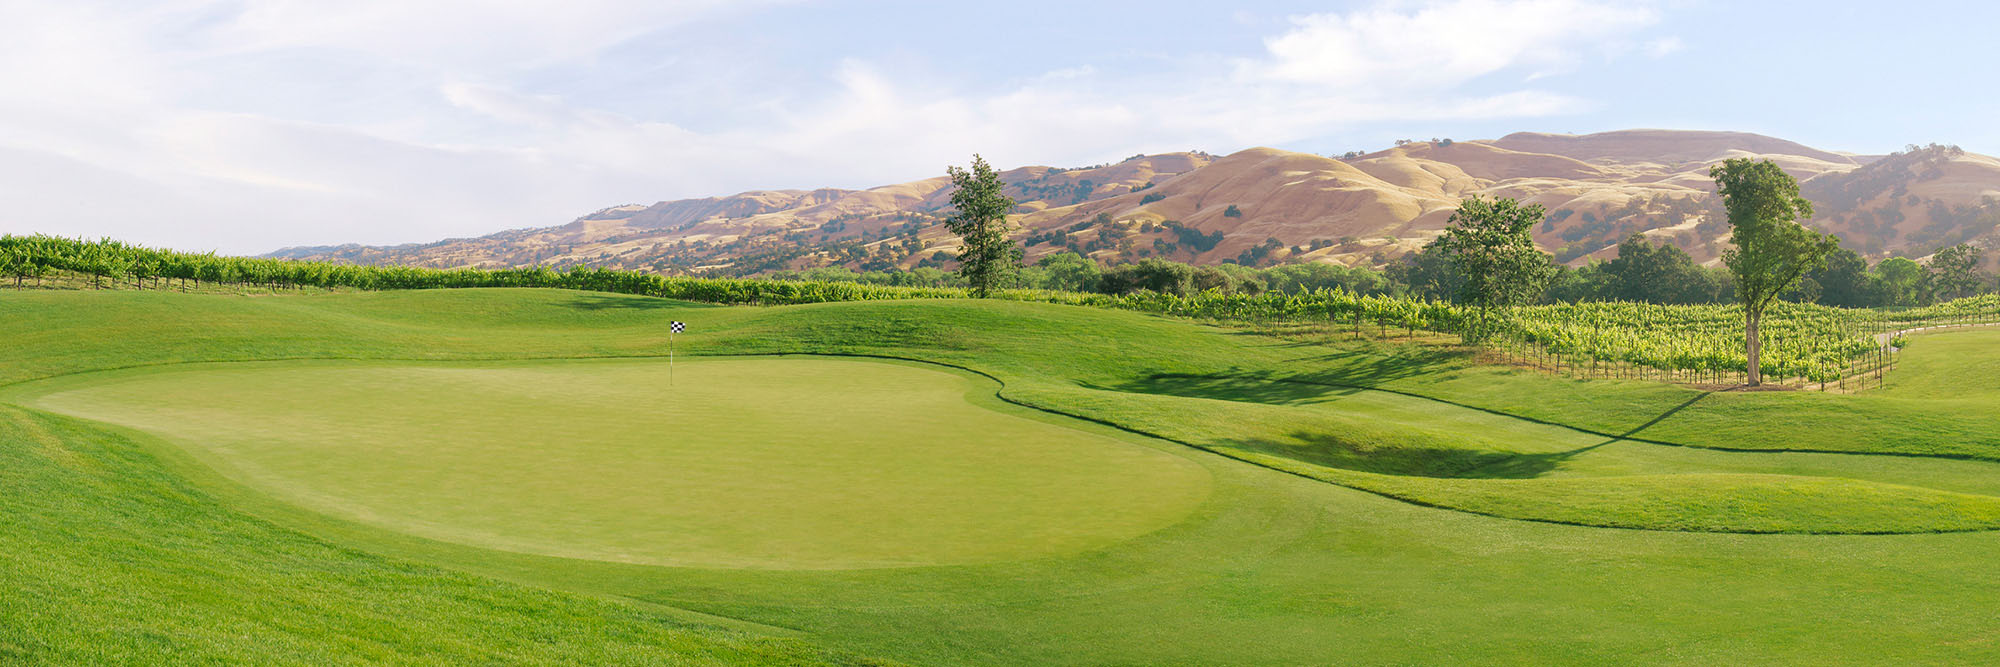 Golf Course Image - Yocha Dehe No. 12